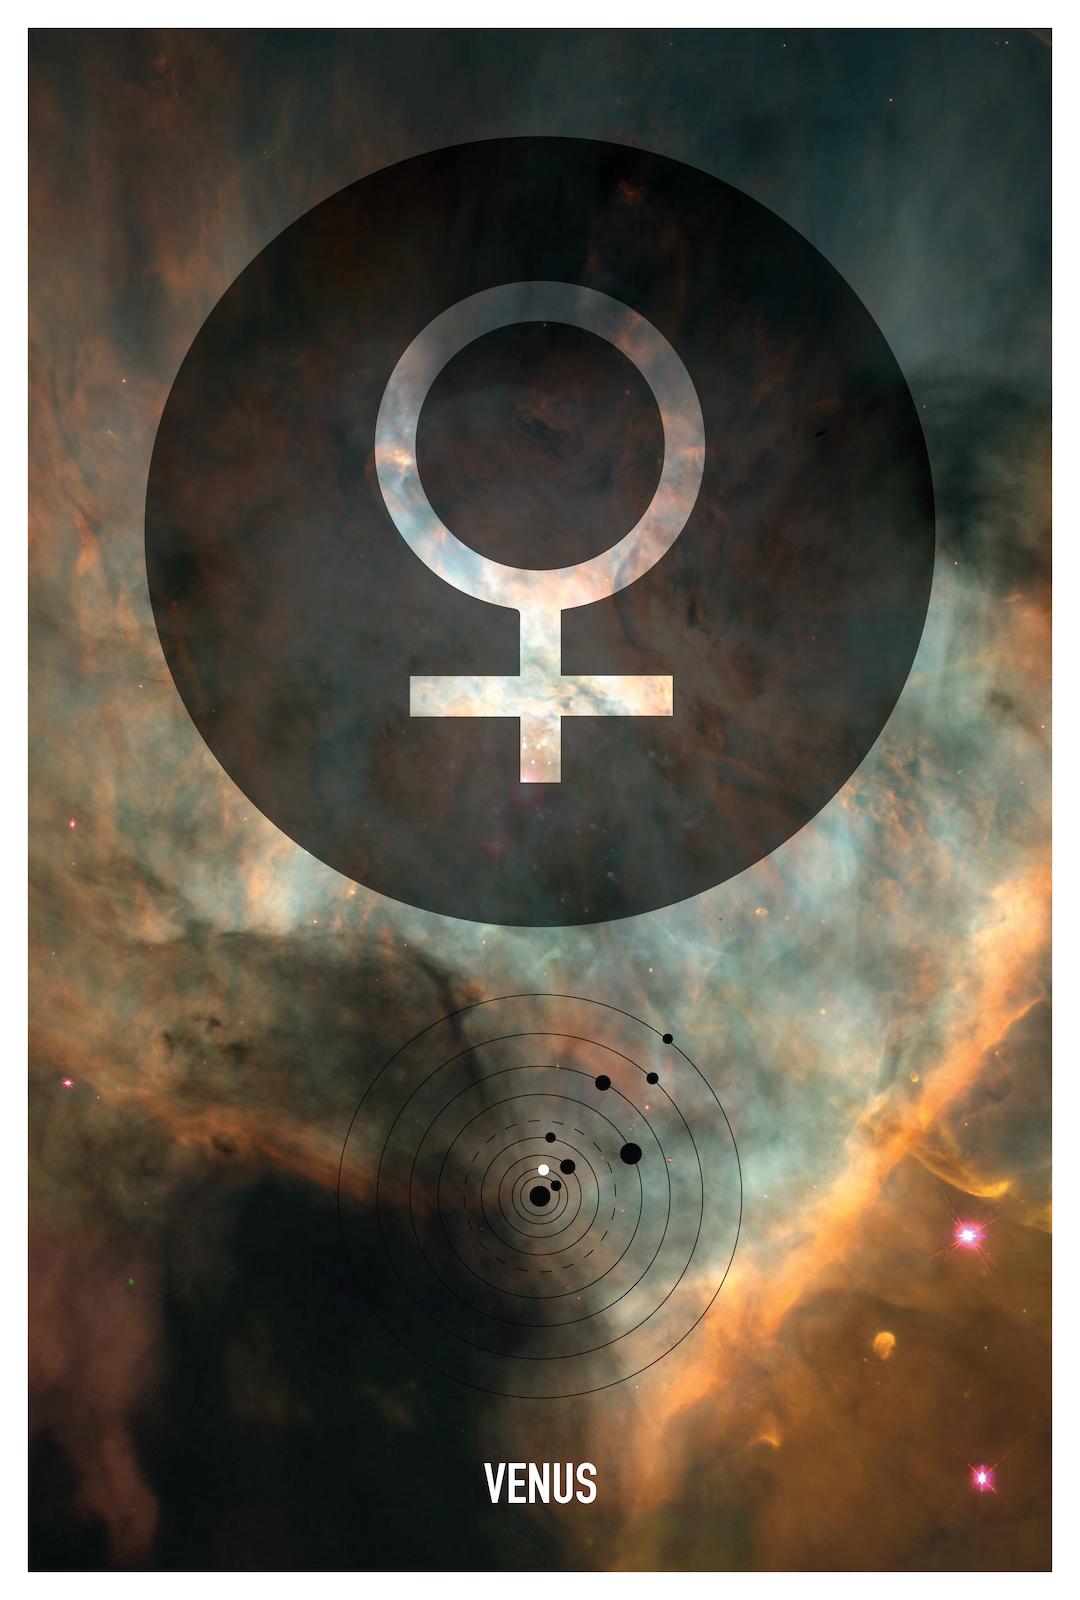 planets2-03.jpg